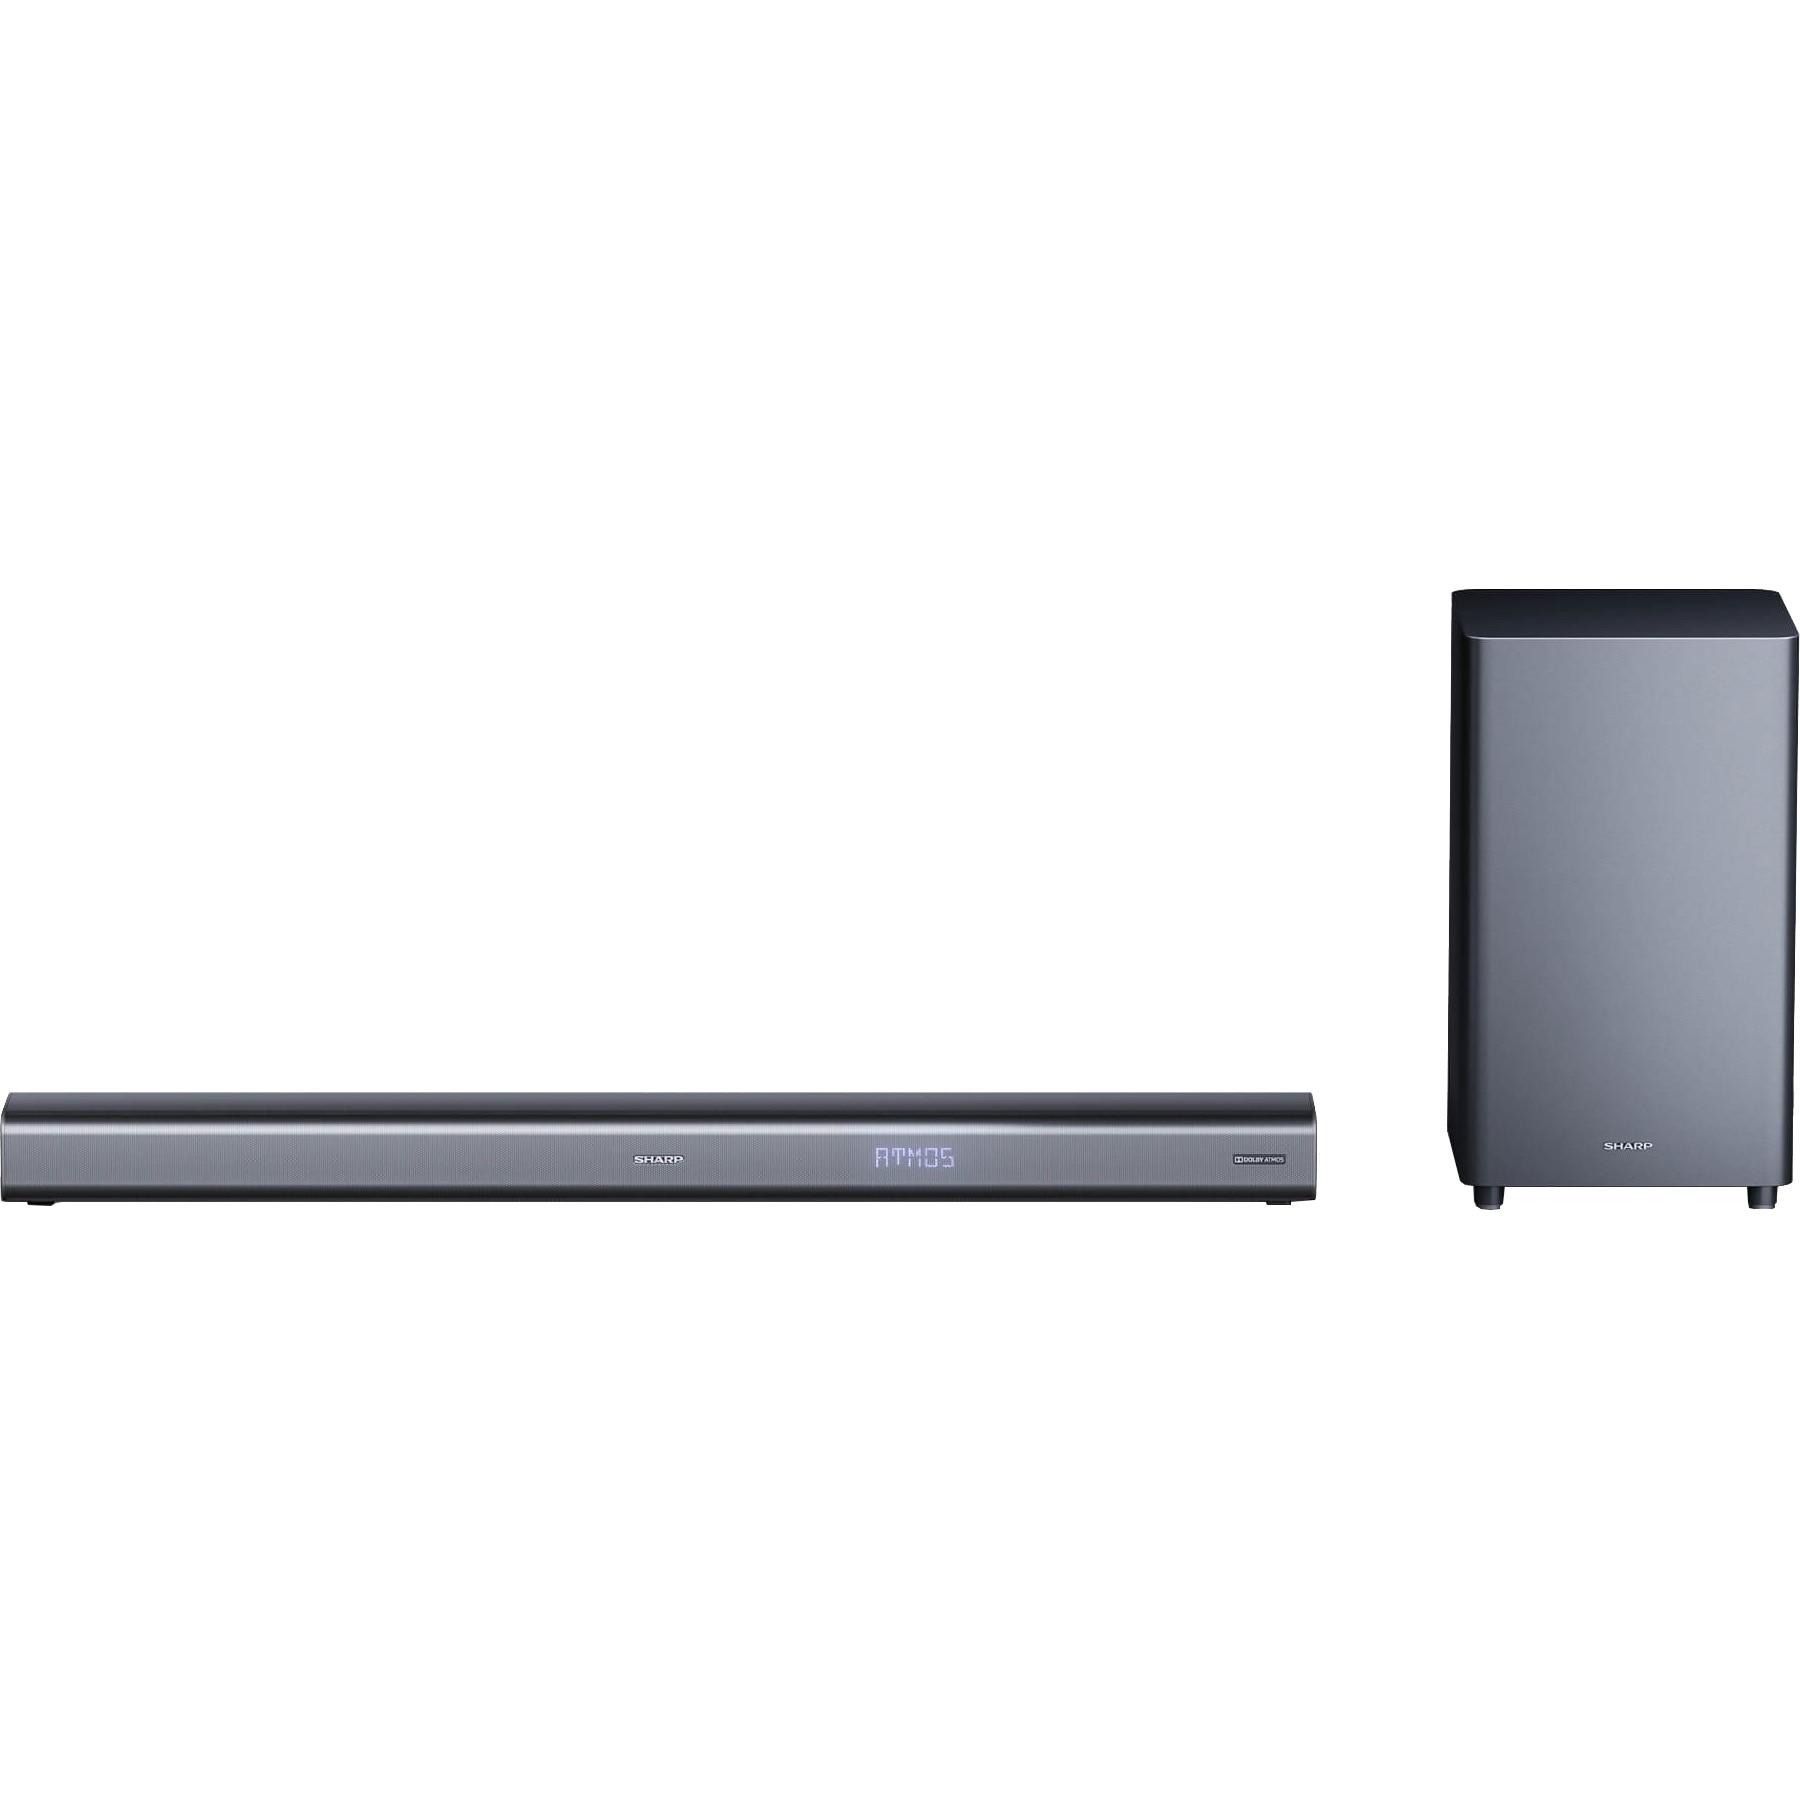 Fotografie Soundbar Sharp HT-SBW460, 3.1, Dolby Atmos, 440W, Virtual Surround Sound, Subwoofer wireless, Bluetooth, Negru